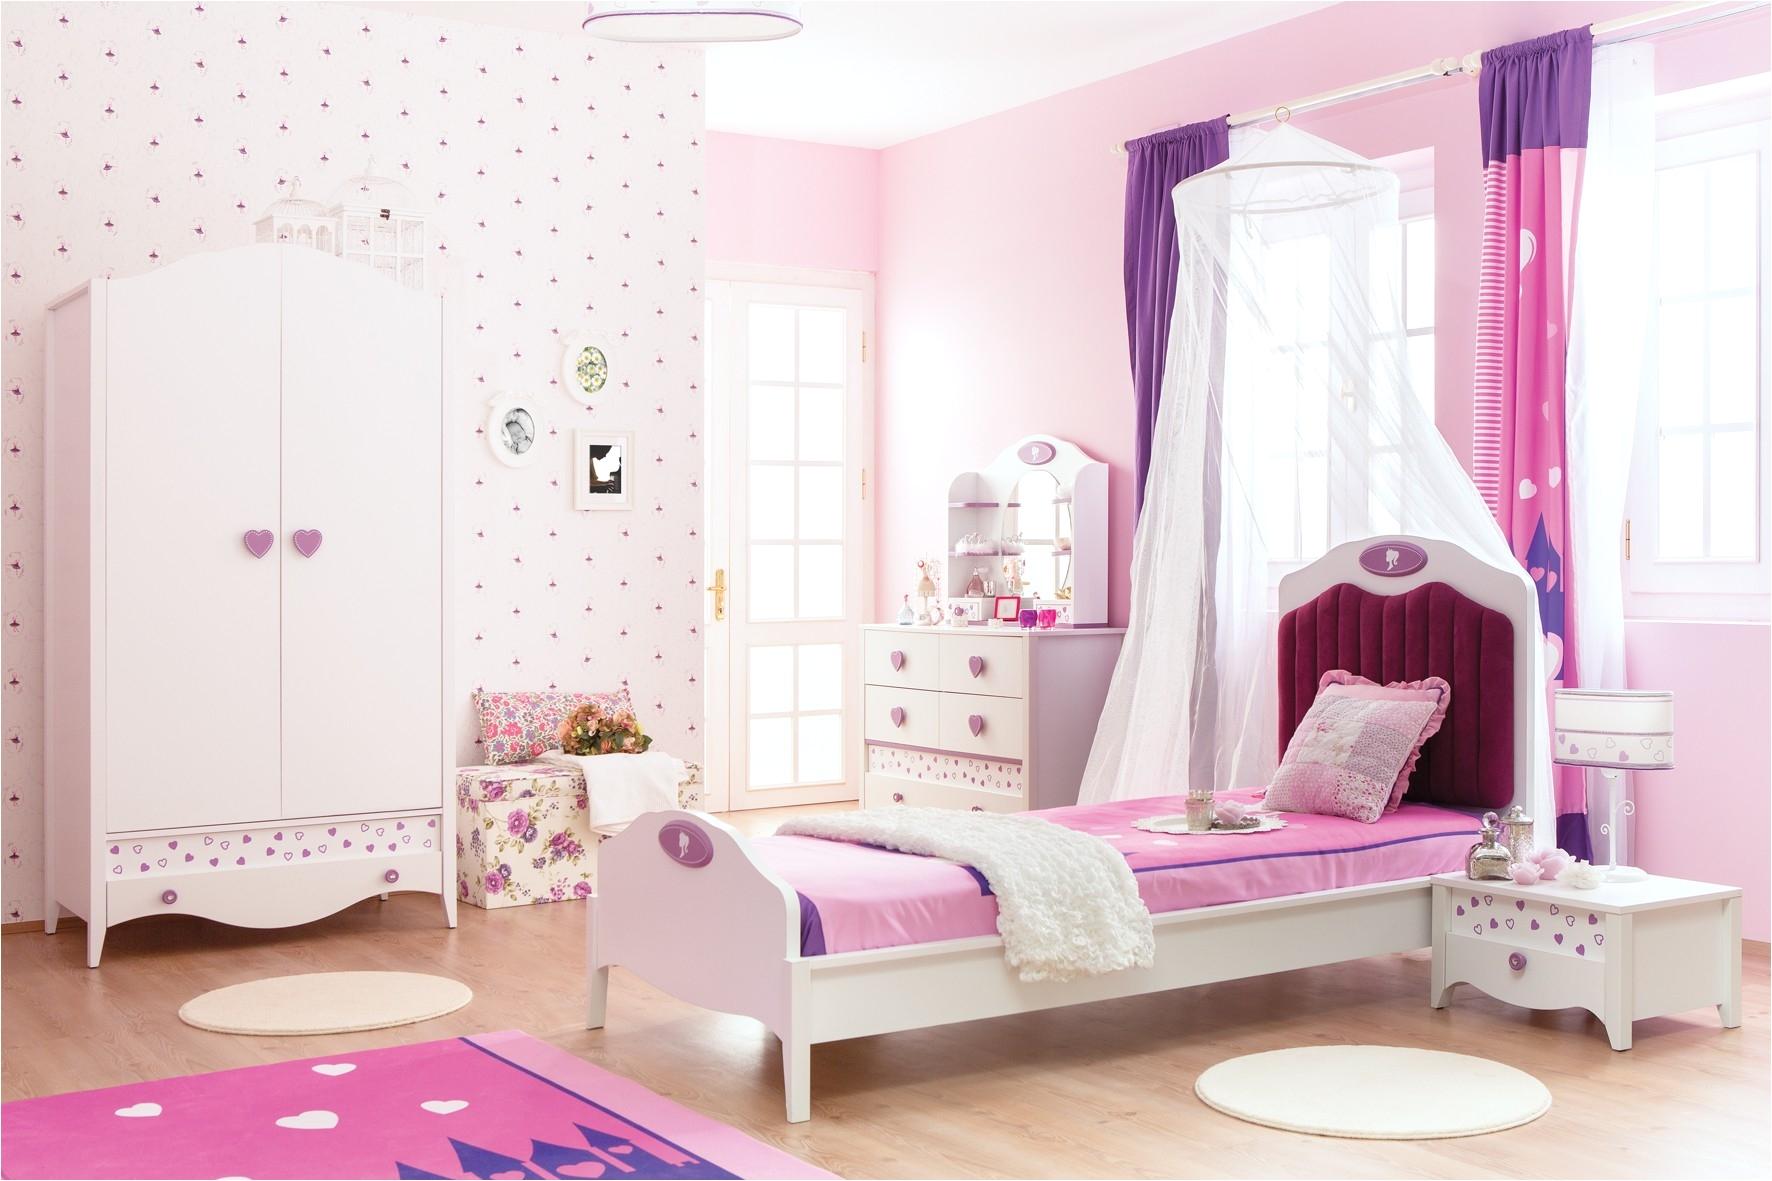 Teenage Chairs for Bedrooms Uk Bedroom Pink Bedroom Furniture Drop Gorgeous Newjoy Princess Girls